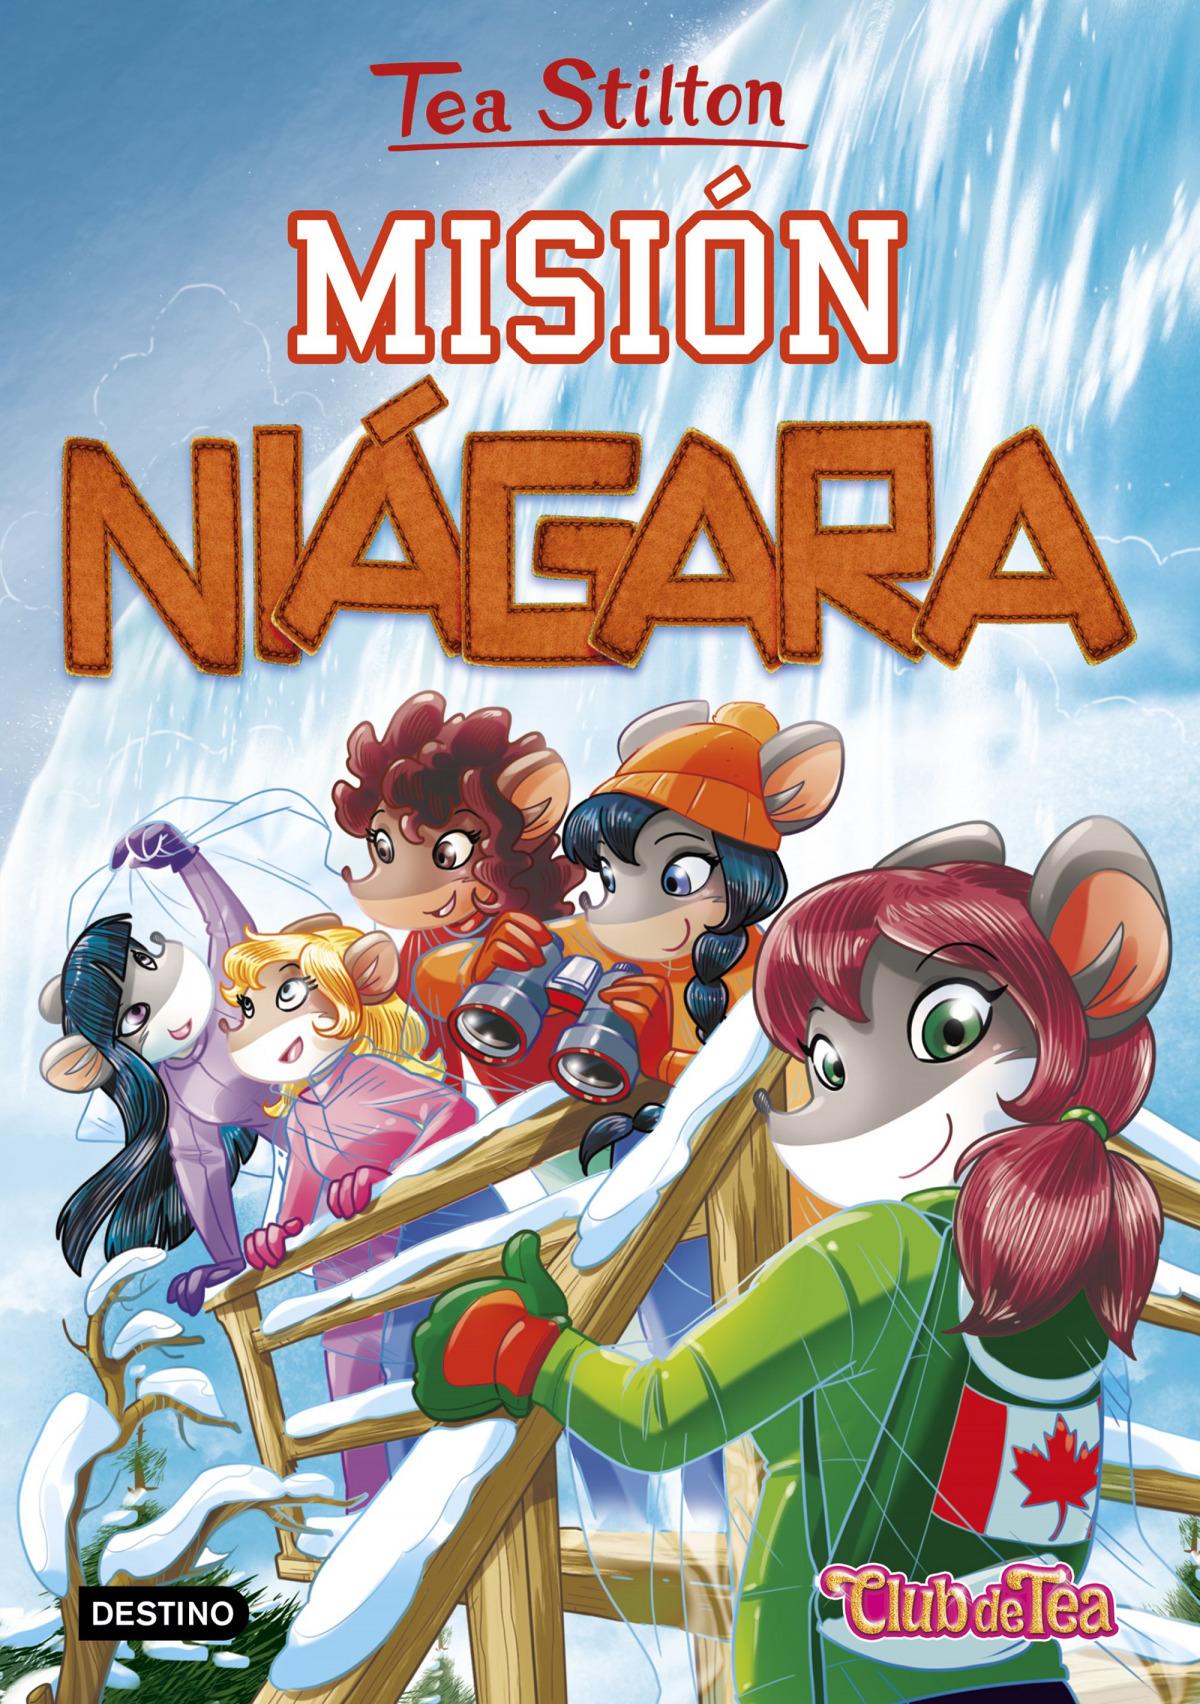 TEA STILTON  MISION NIAGARA